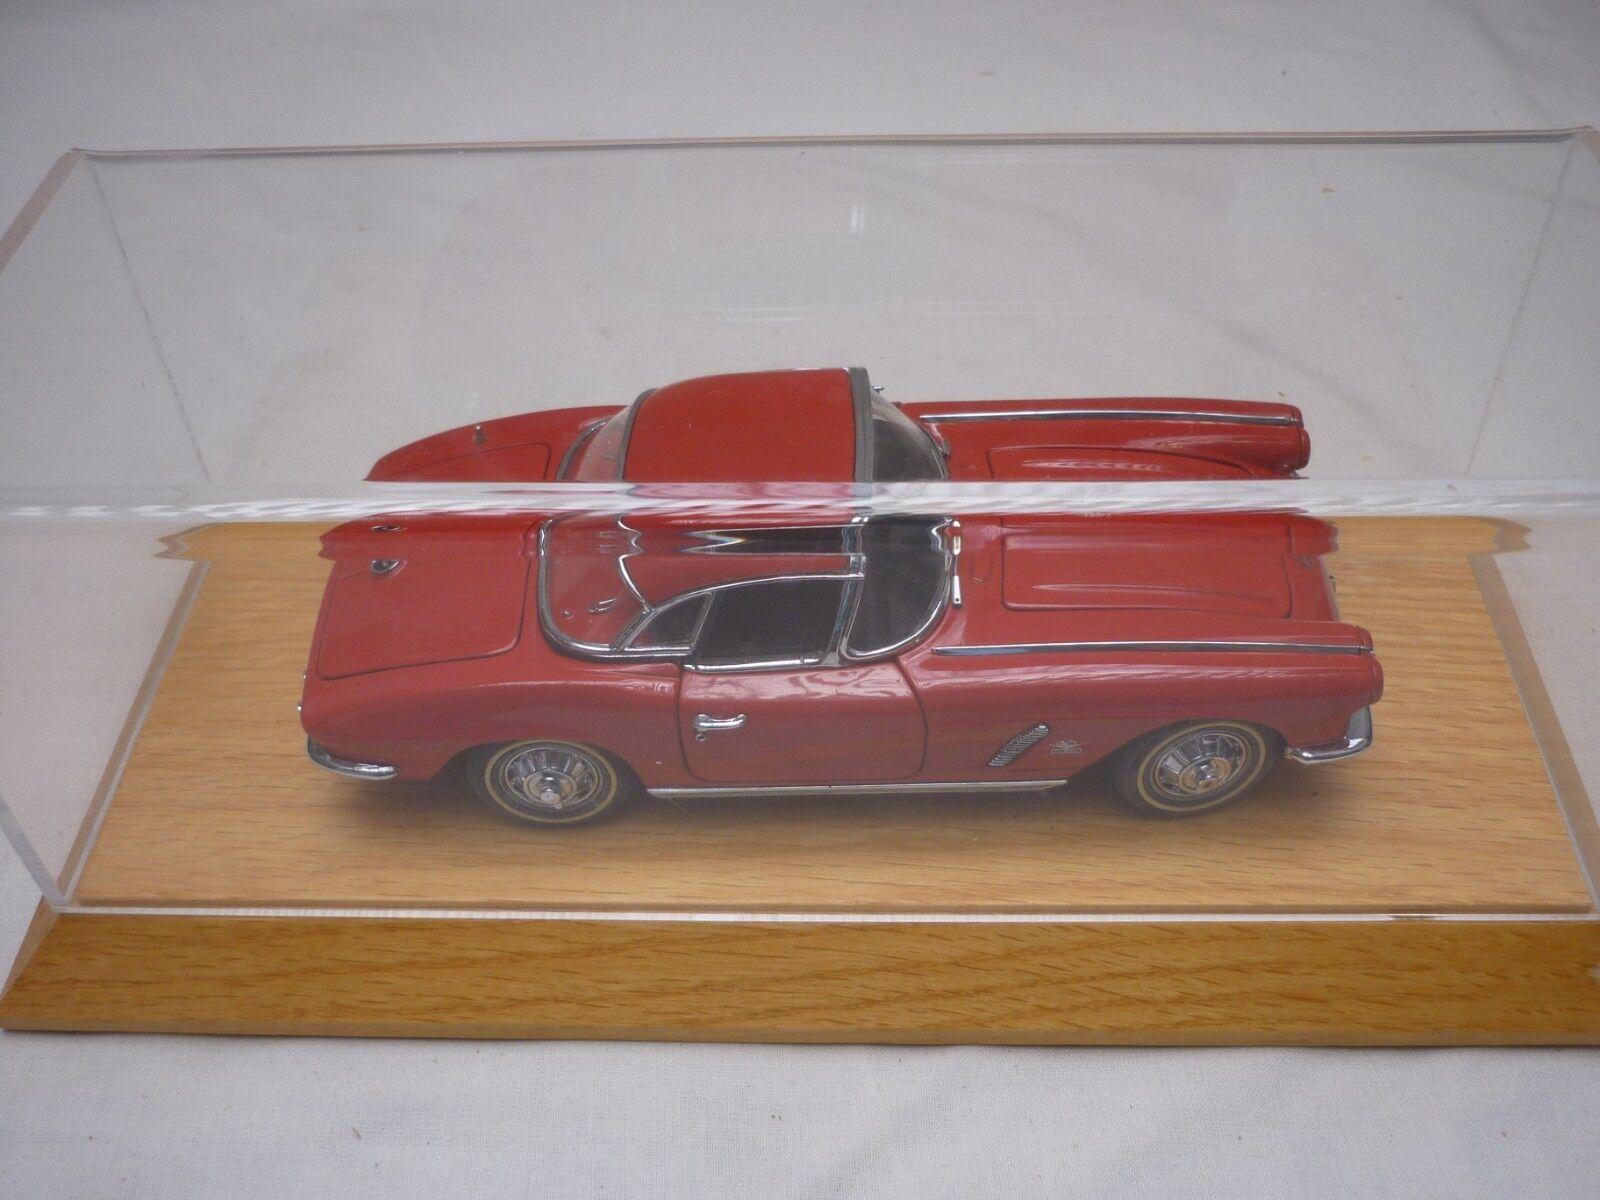 A Danbury mint scale model of a 1962 Chevrolet Corvette,  display case.